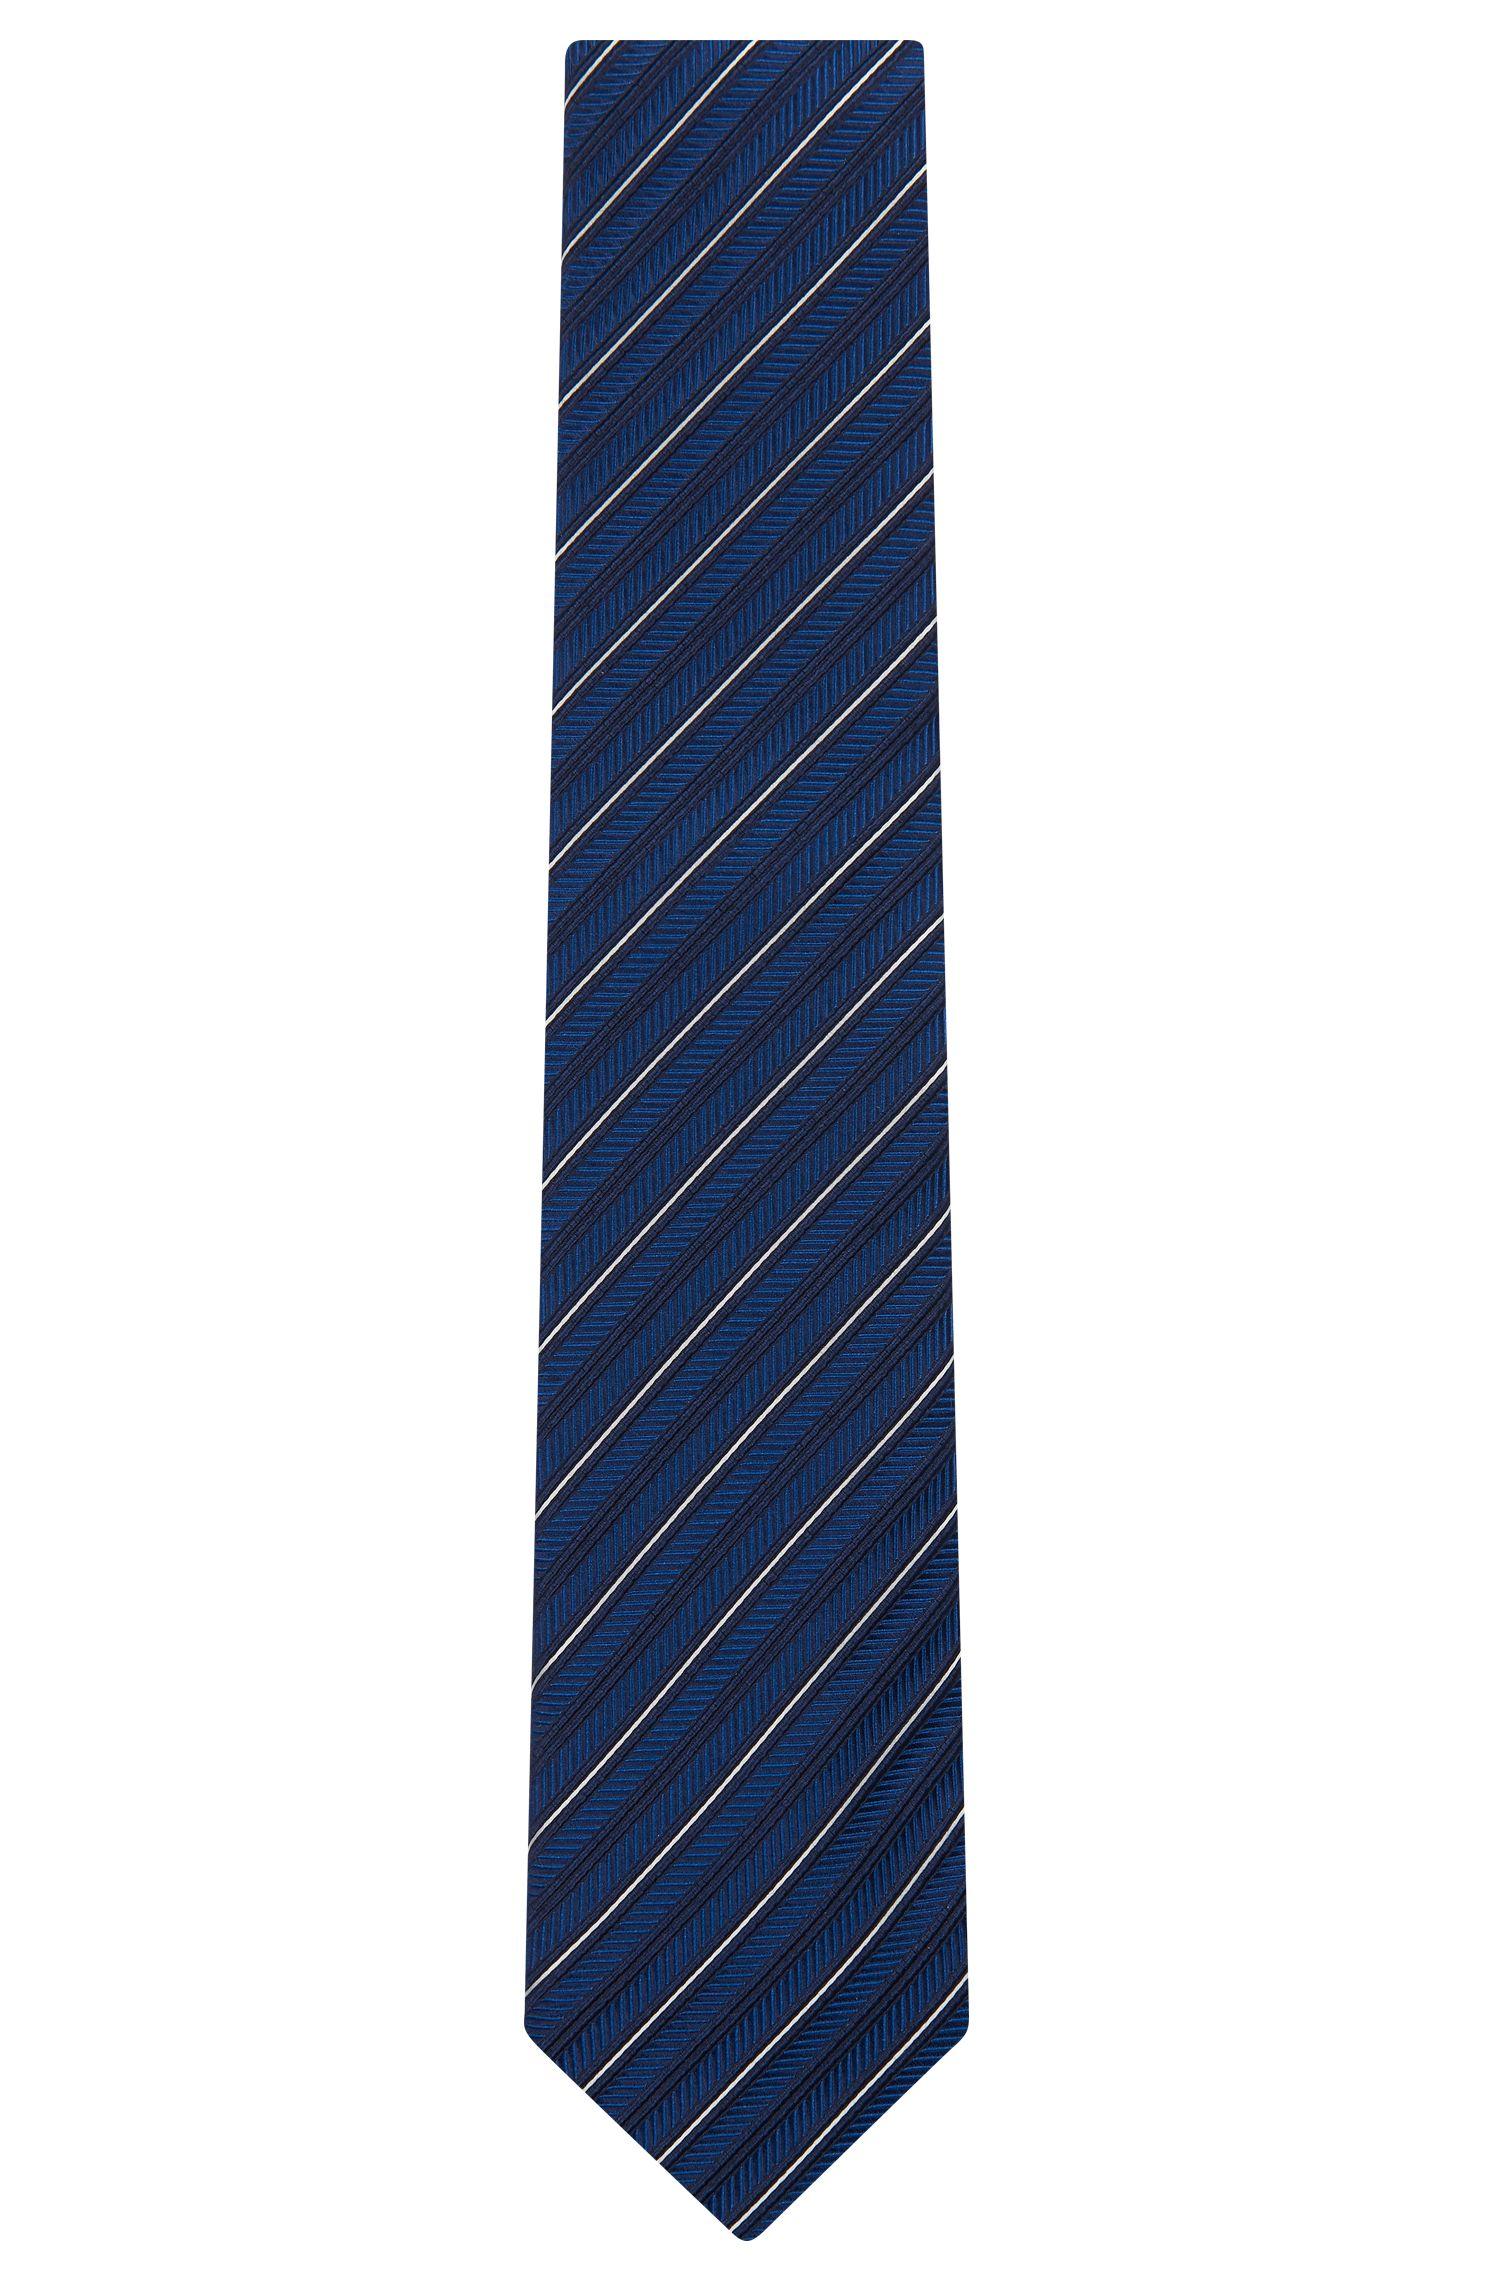 Embroidered Italian Silk Tie